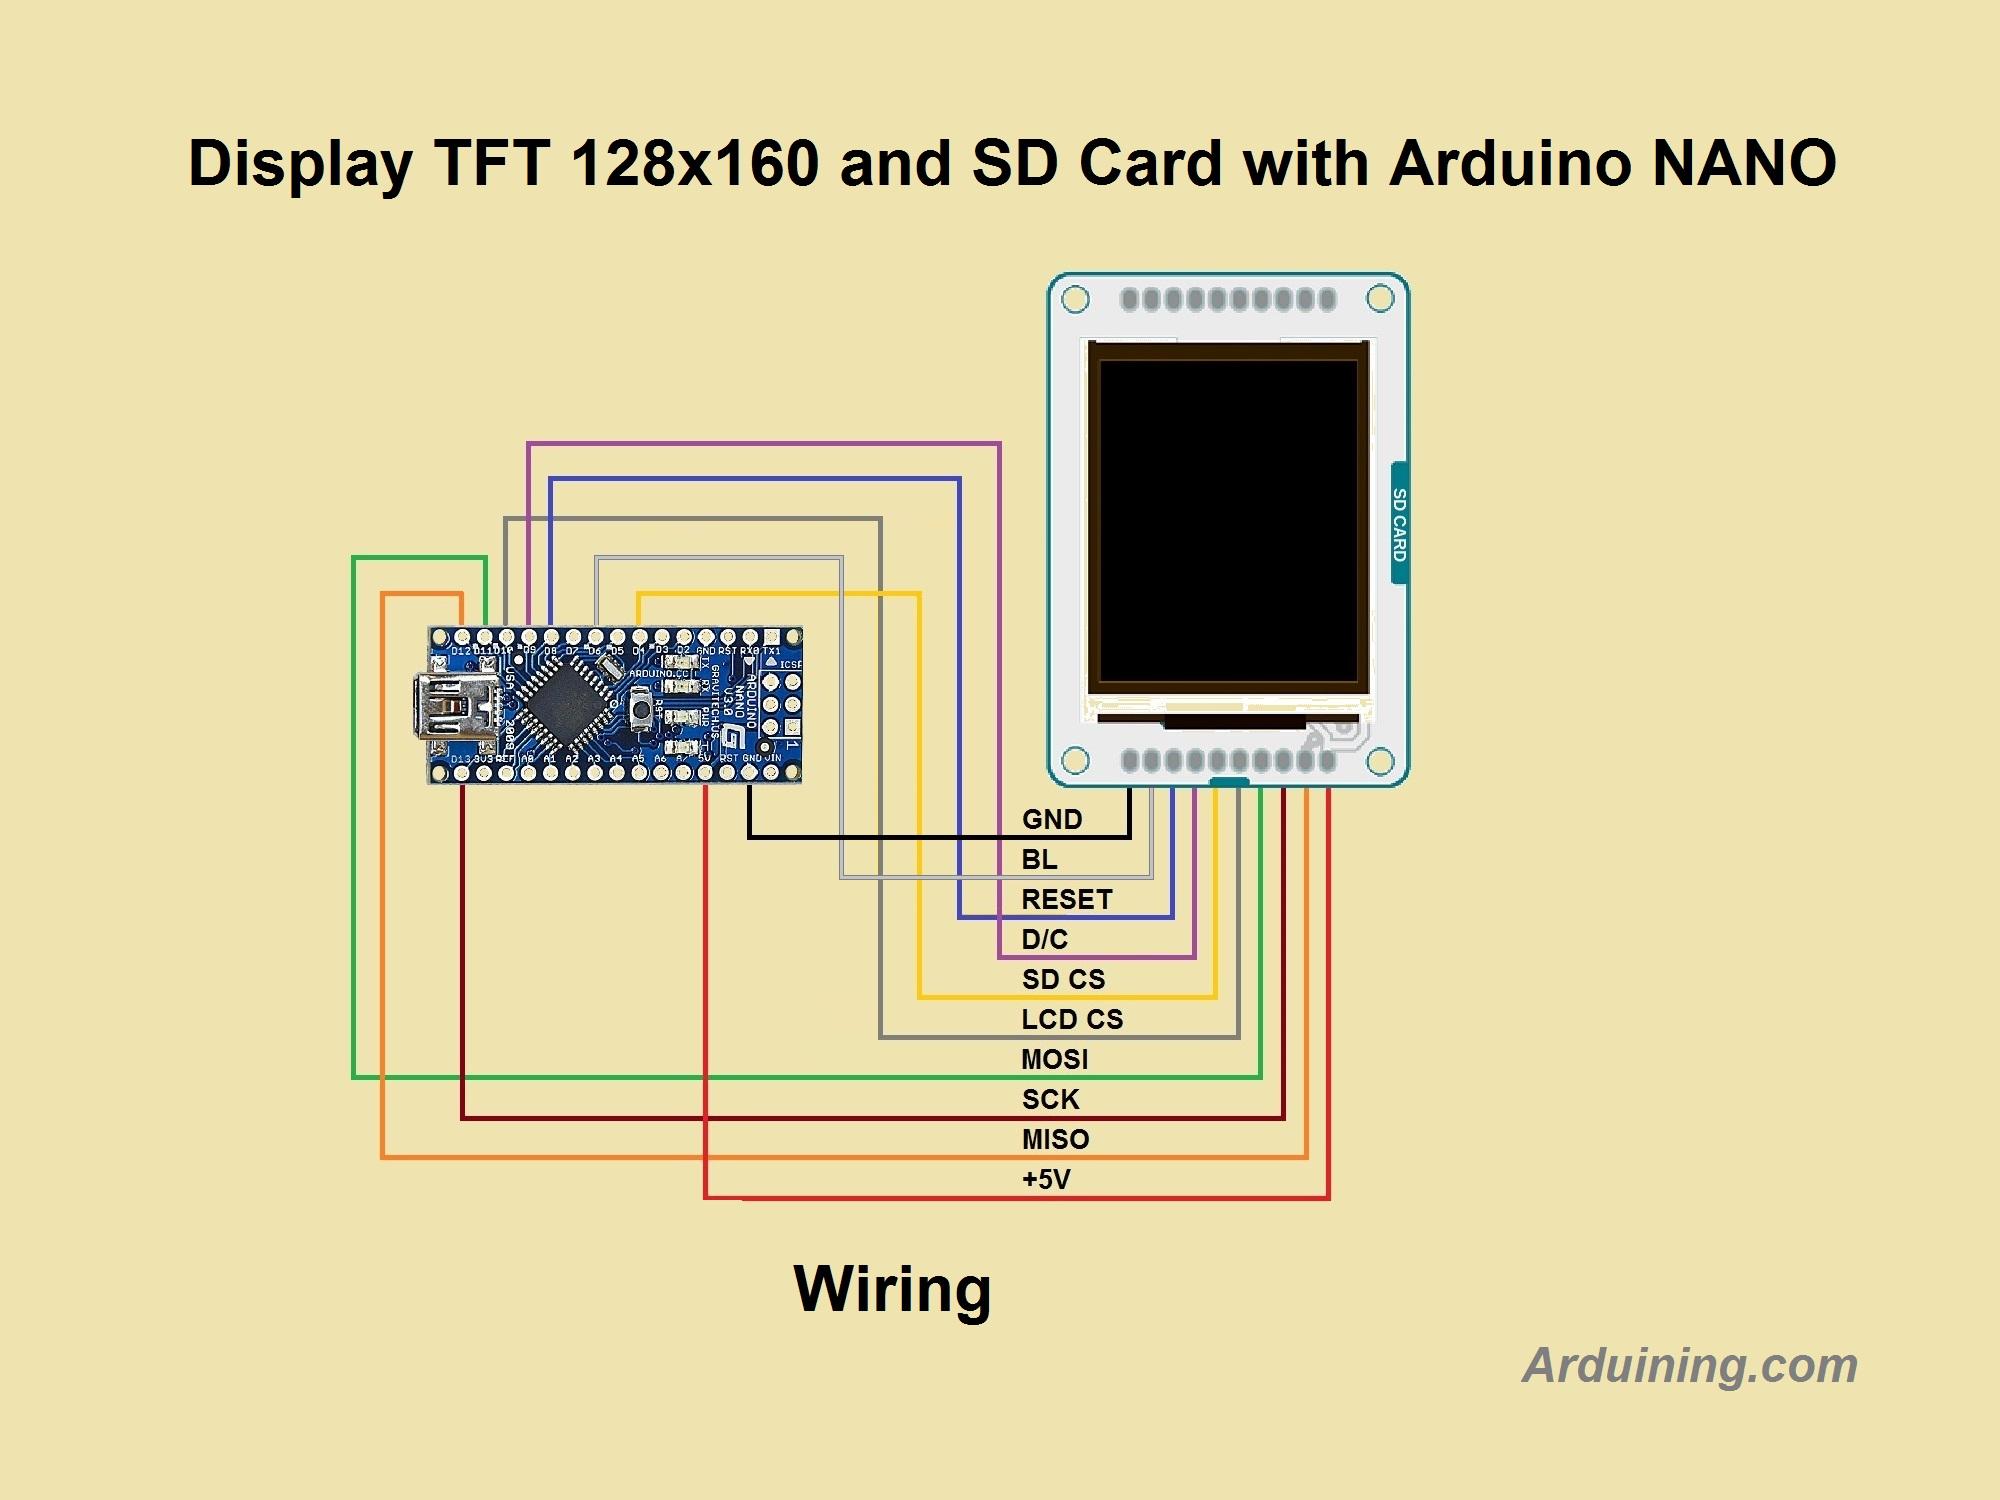 Tft Wiring Diagram Diagrams Schematics 3 Way Switch Arduino Display To Nano Arduining On Building Light